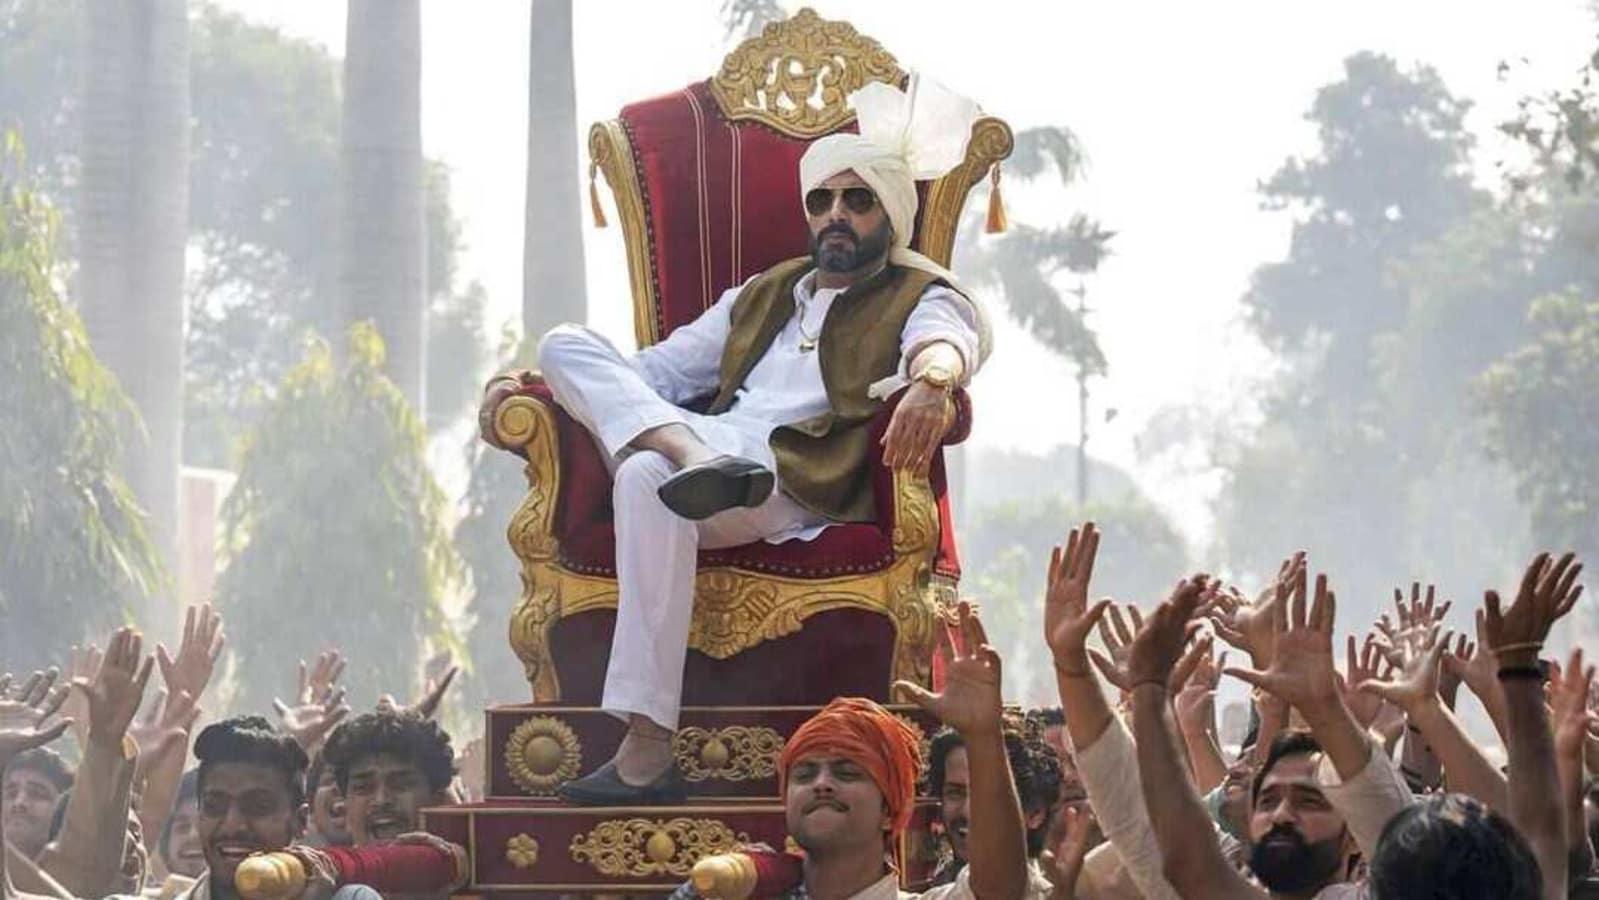 Abhishek Bachchan carves a powerful figure as Ganga Ram Chaudhary in new Dasvi still - Hindustan Times